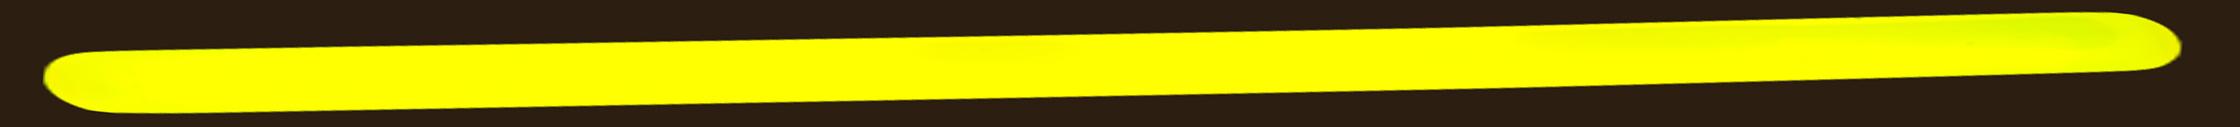 yellow stroke